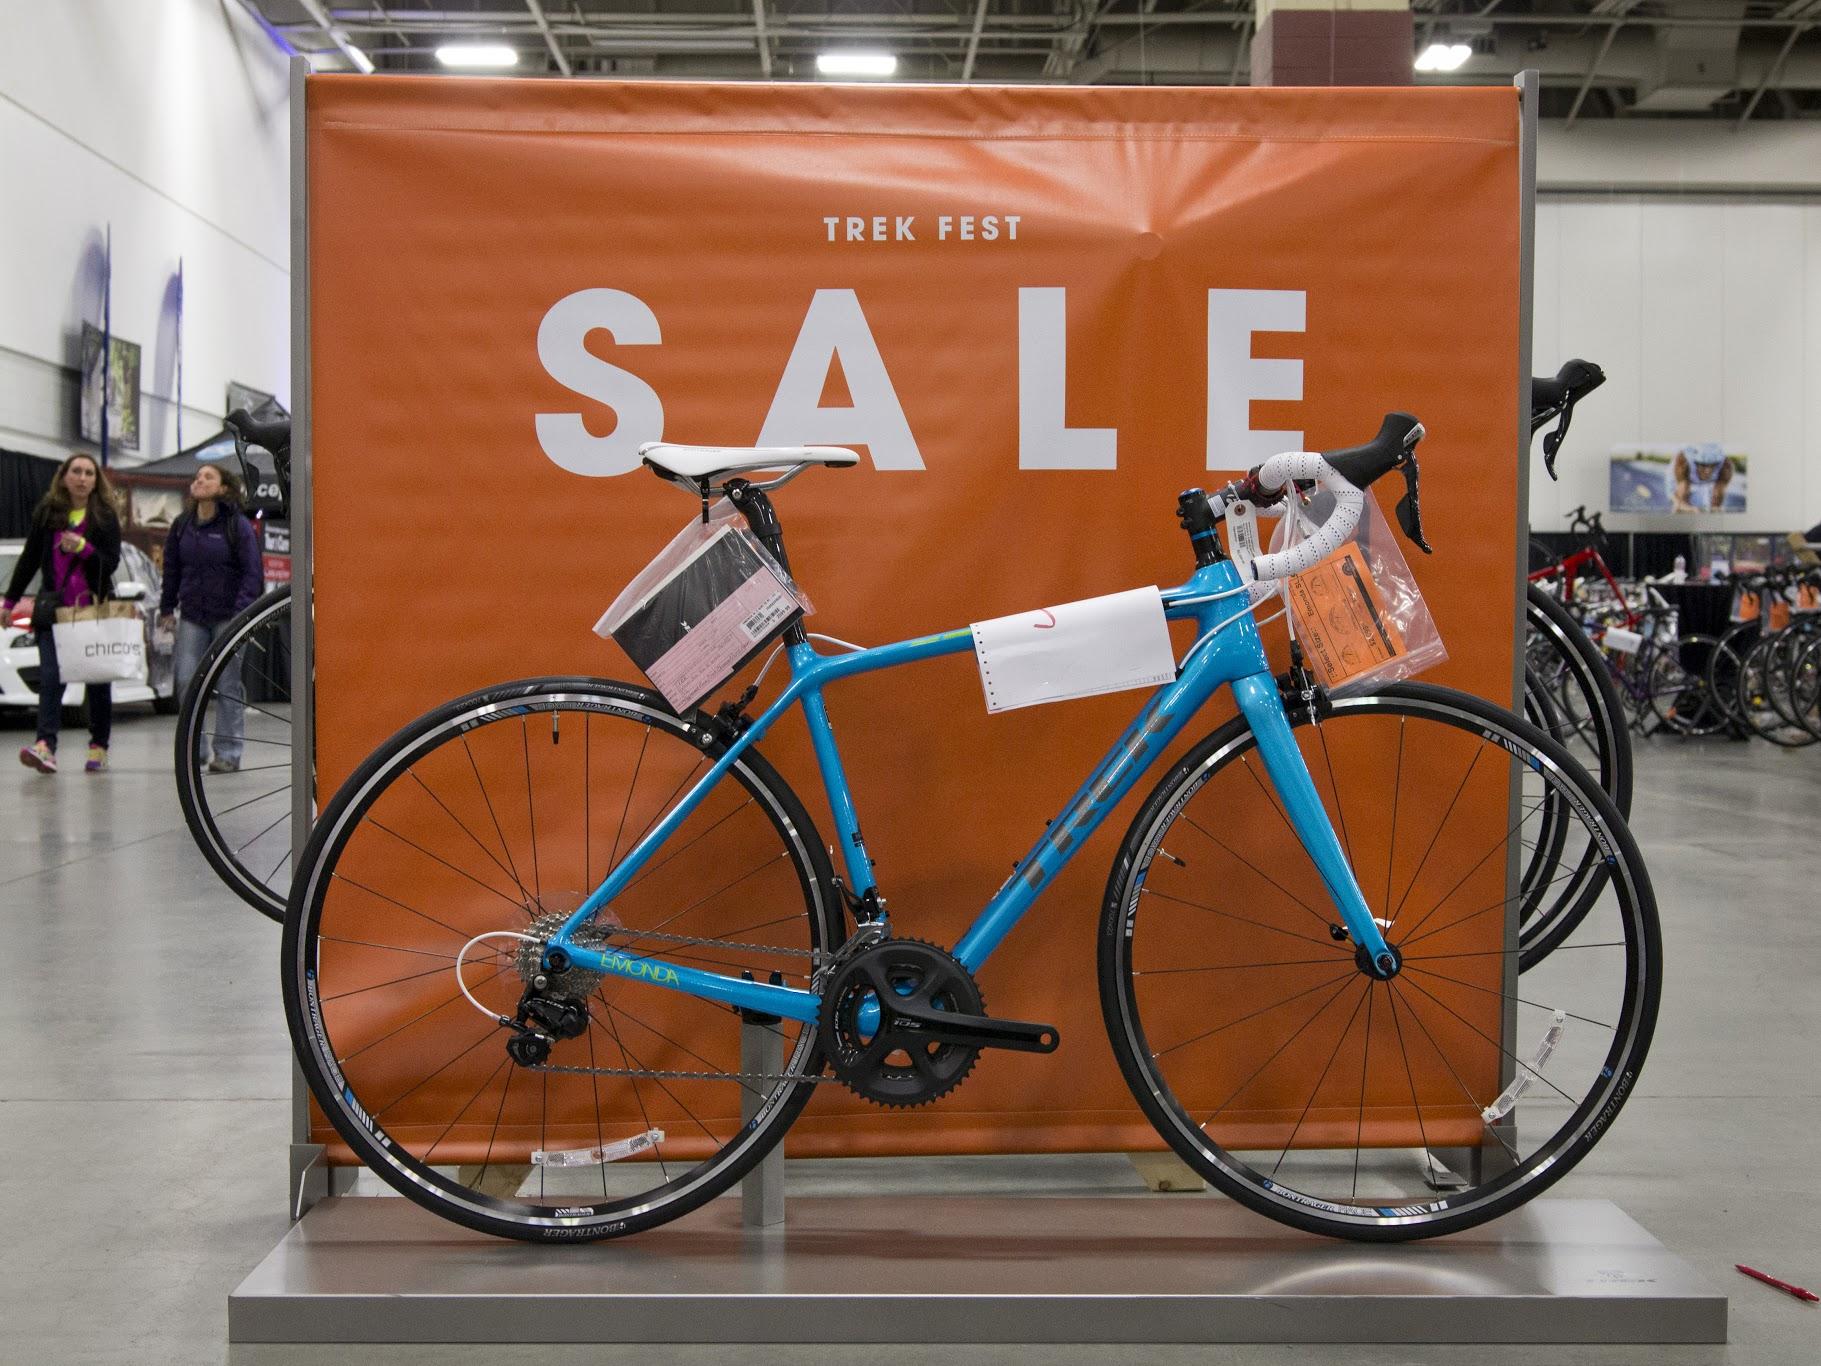 bike expo sale 3.jpg